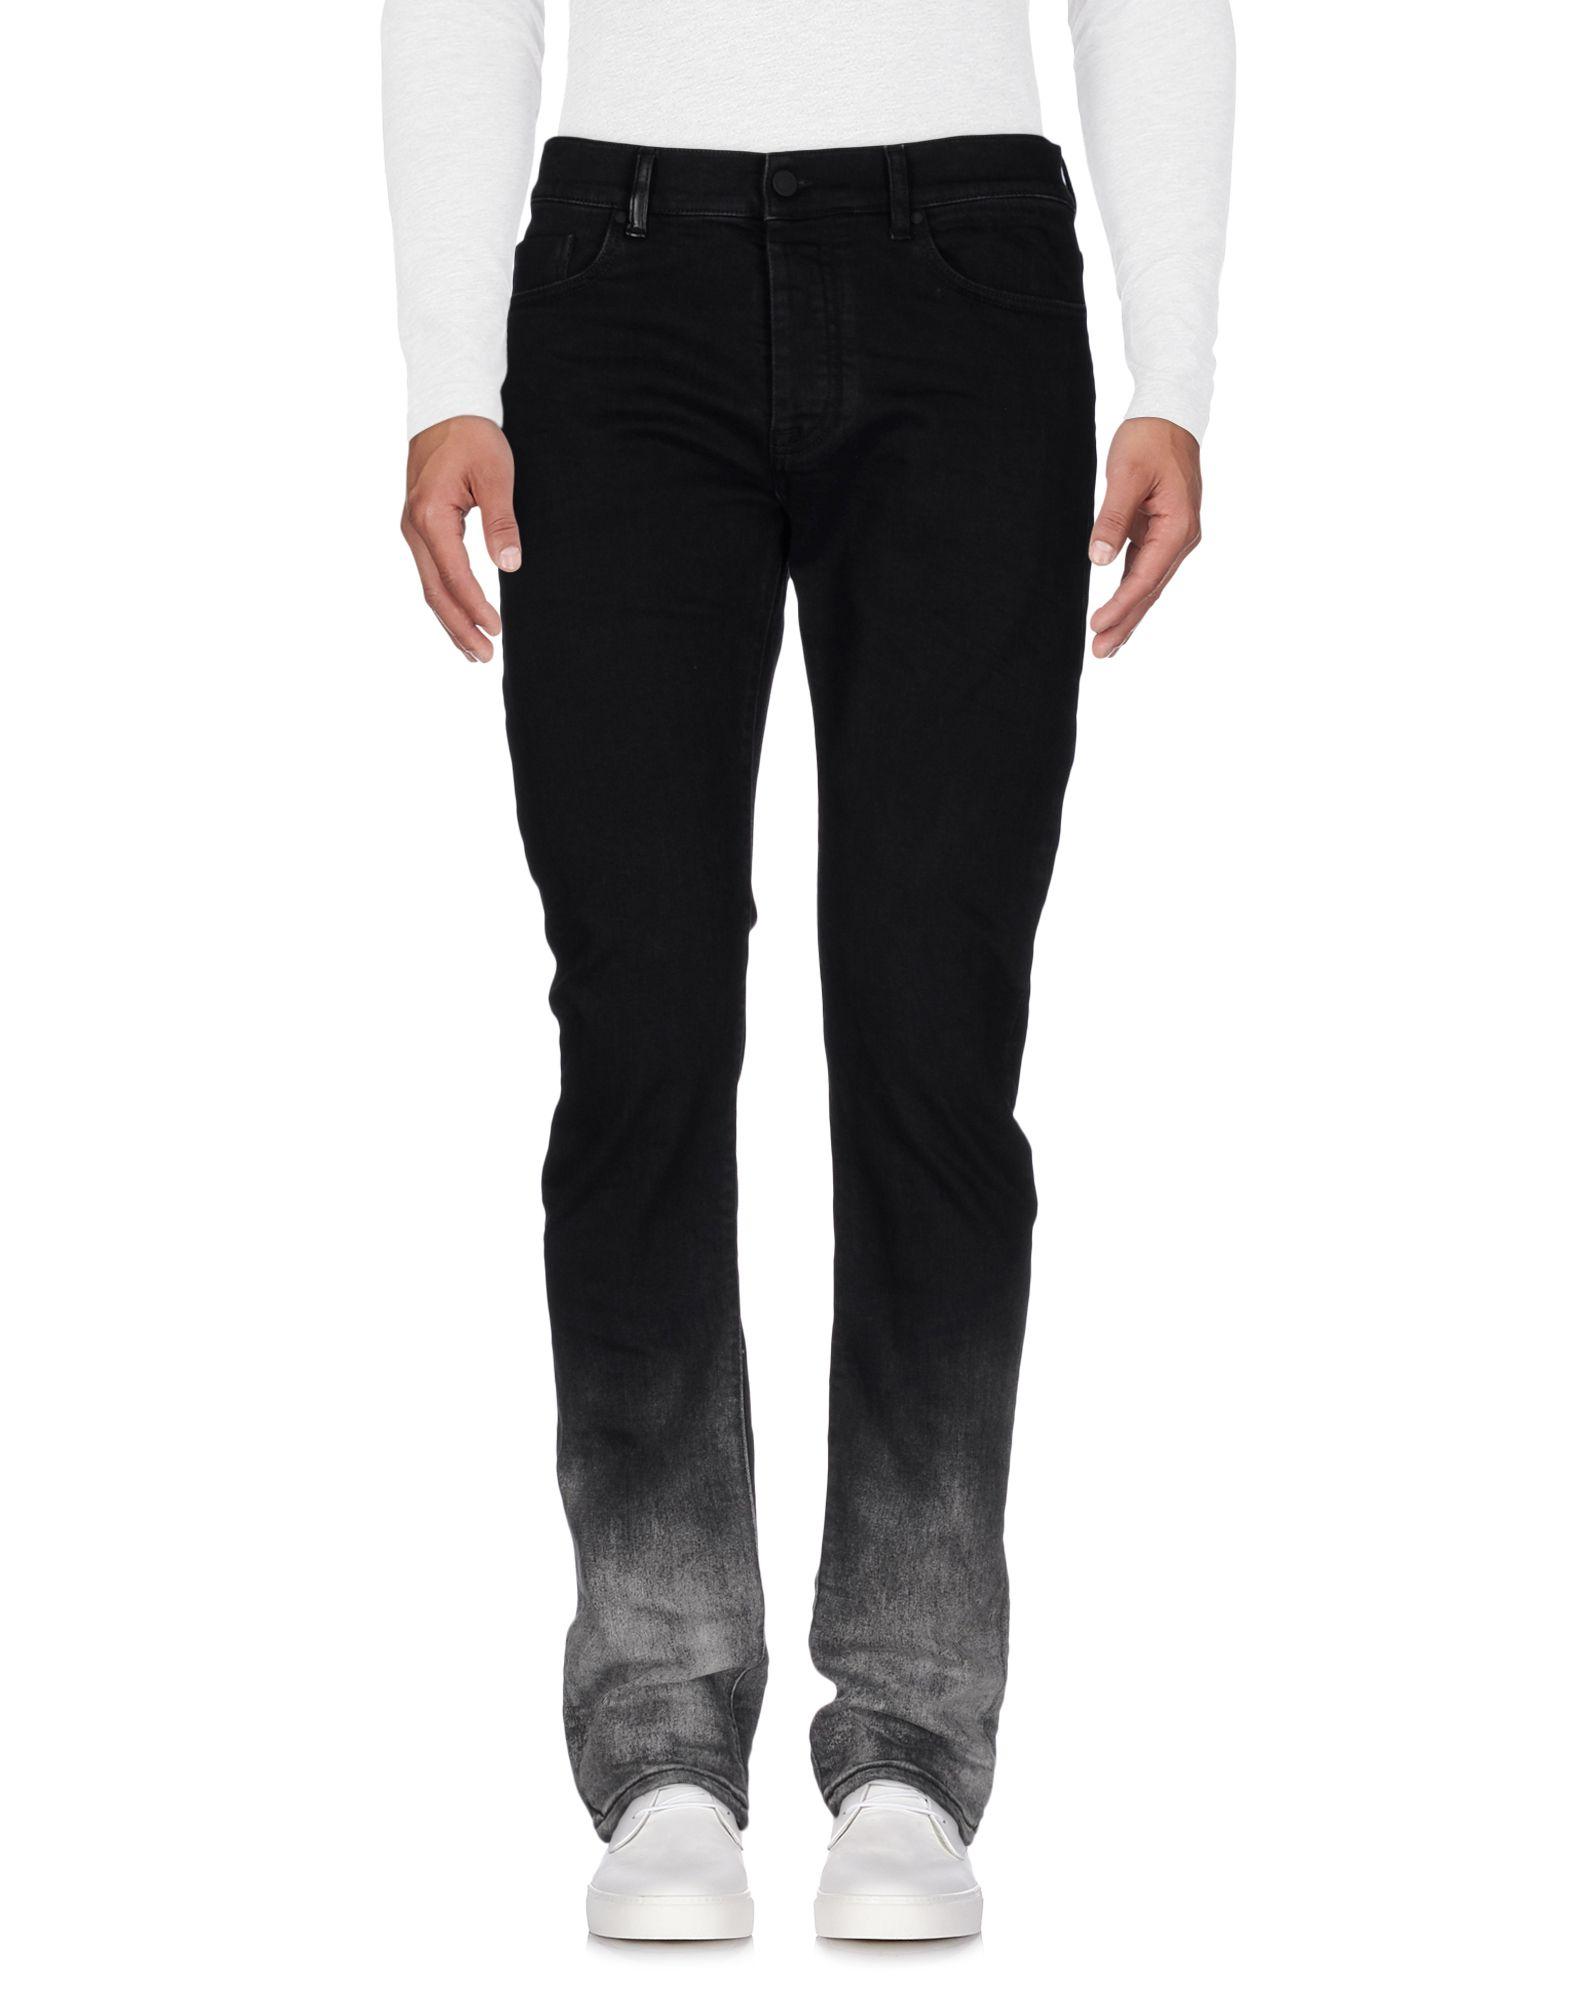 Pantaloni Jeans Marcelo Burlon Uomo - Acquista online su